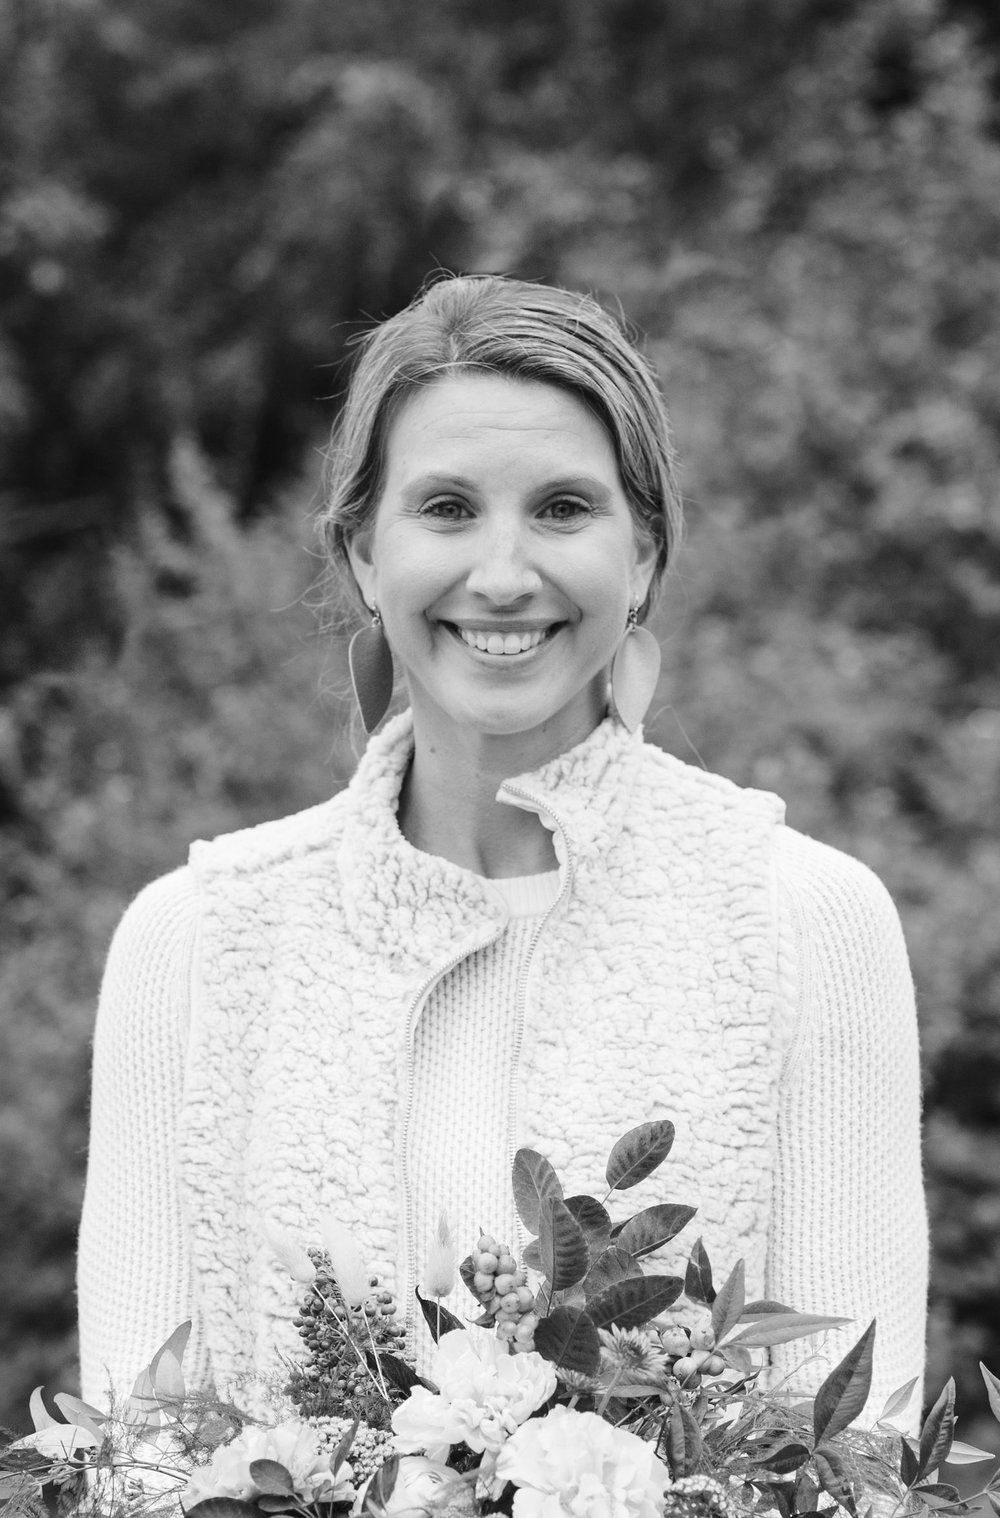 Nicole Shea, Associate Publisher